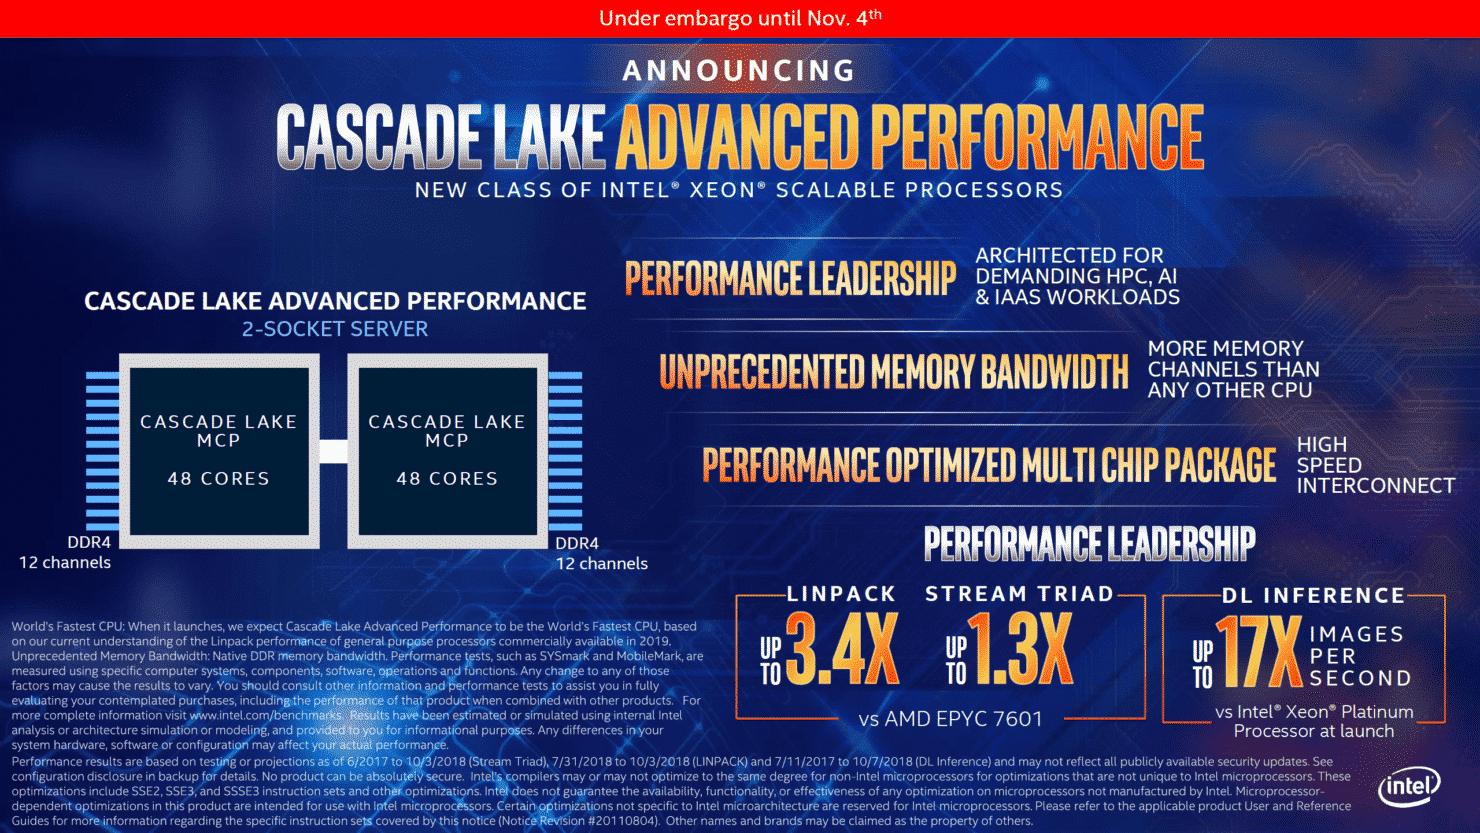 Intel Launches 48-Core Cascade Lake EP, Xeon E-2100 Processors